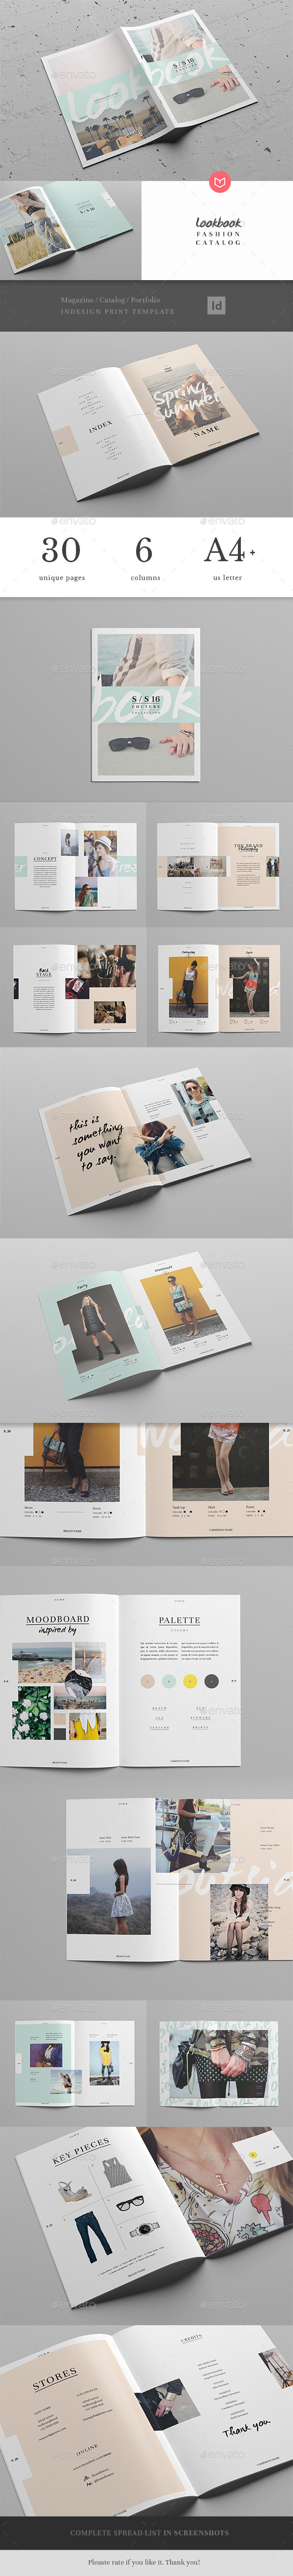 Lookbook / Fashion Magazine + Catalogue - Magazines Print Templates